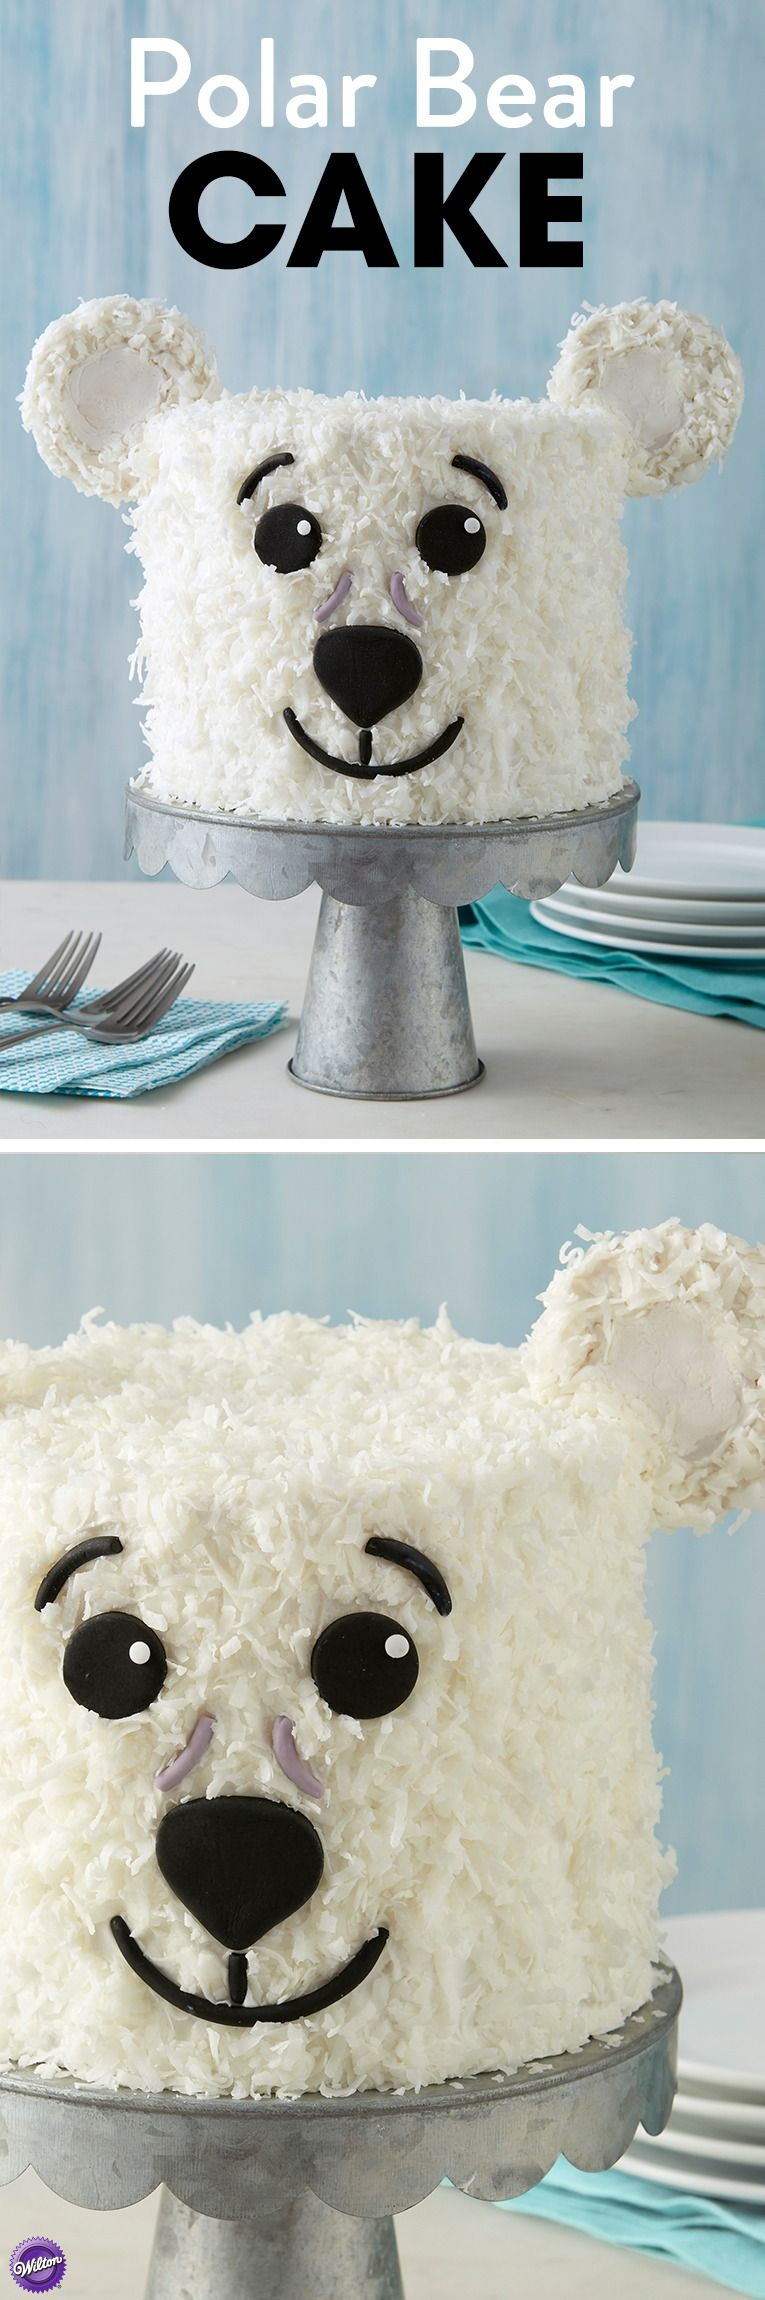 polar bear cake cake inspiration bear cakes birthday. Black Bedroom Furniture Sets. Home Design Ideas